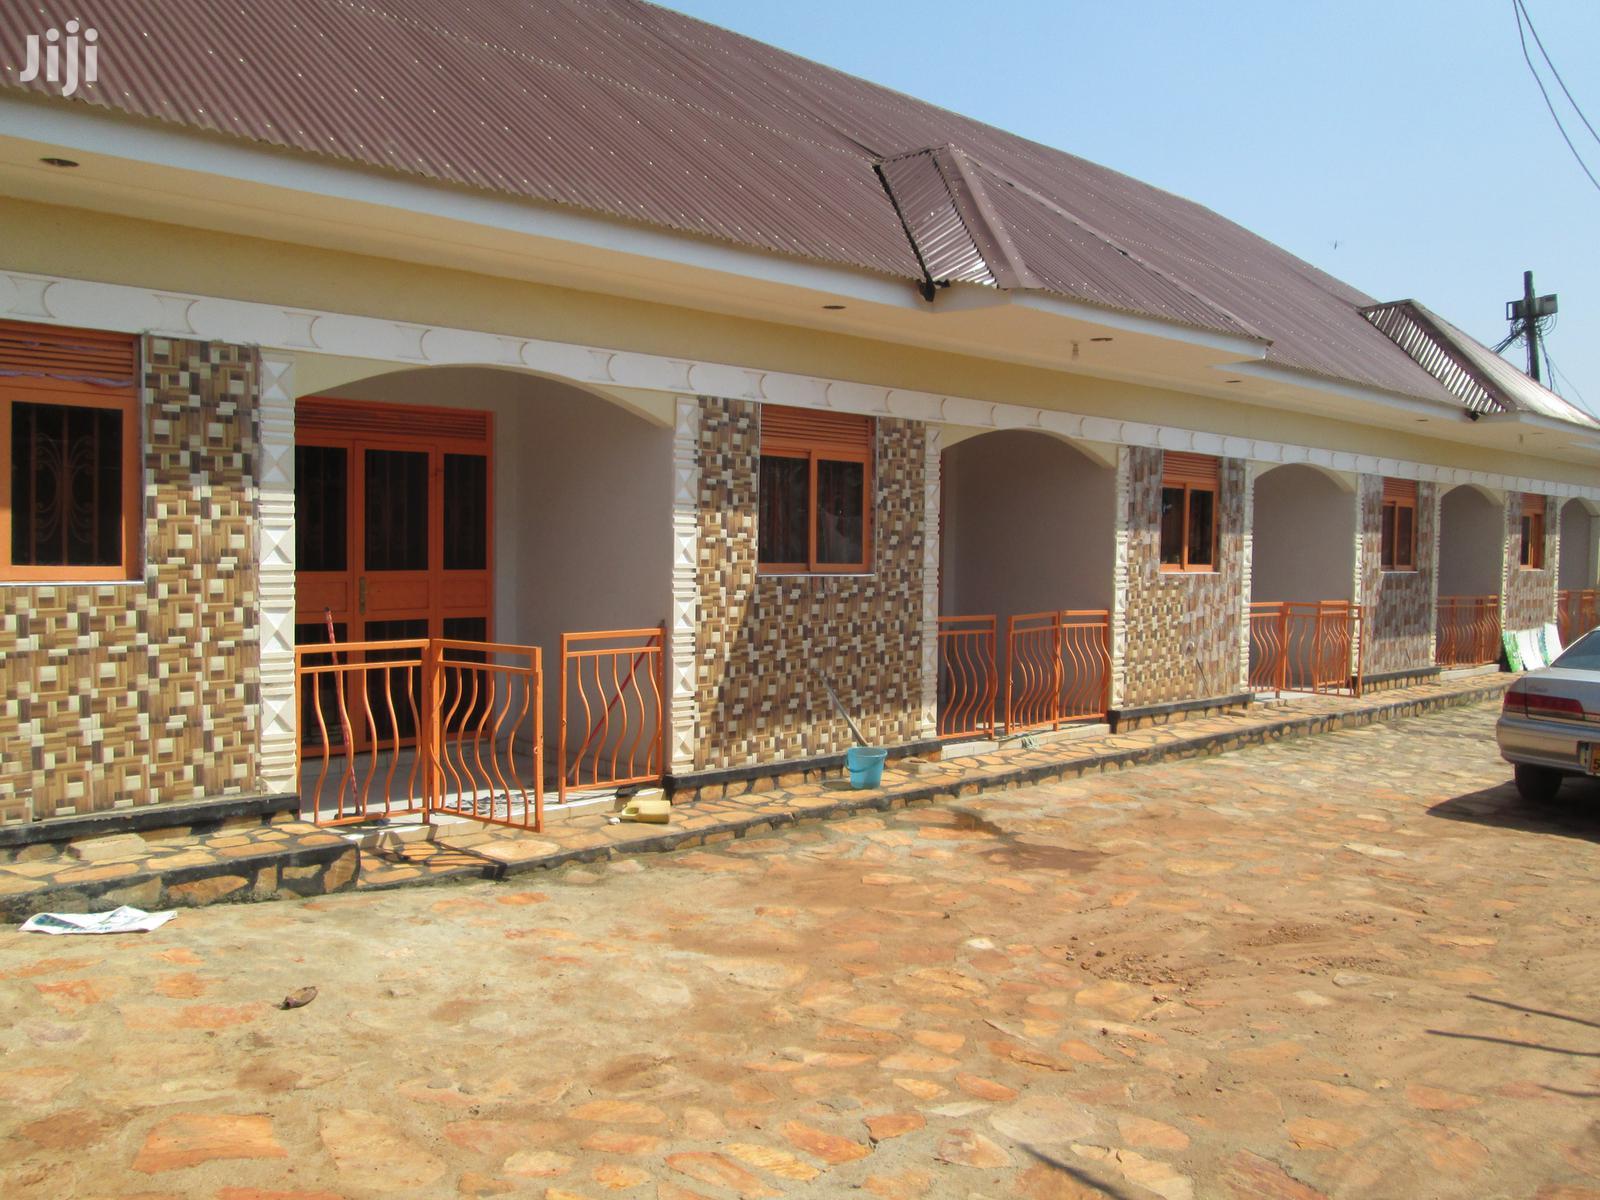 Brand New Single Bedroom House In Kirinya Along Bukasa Road For Rent